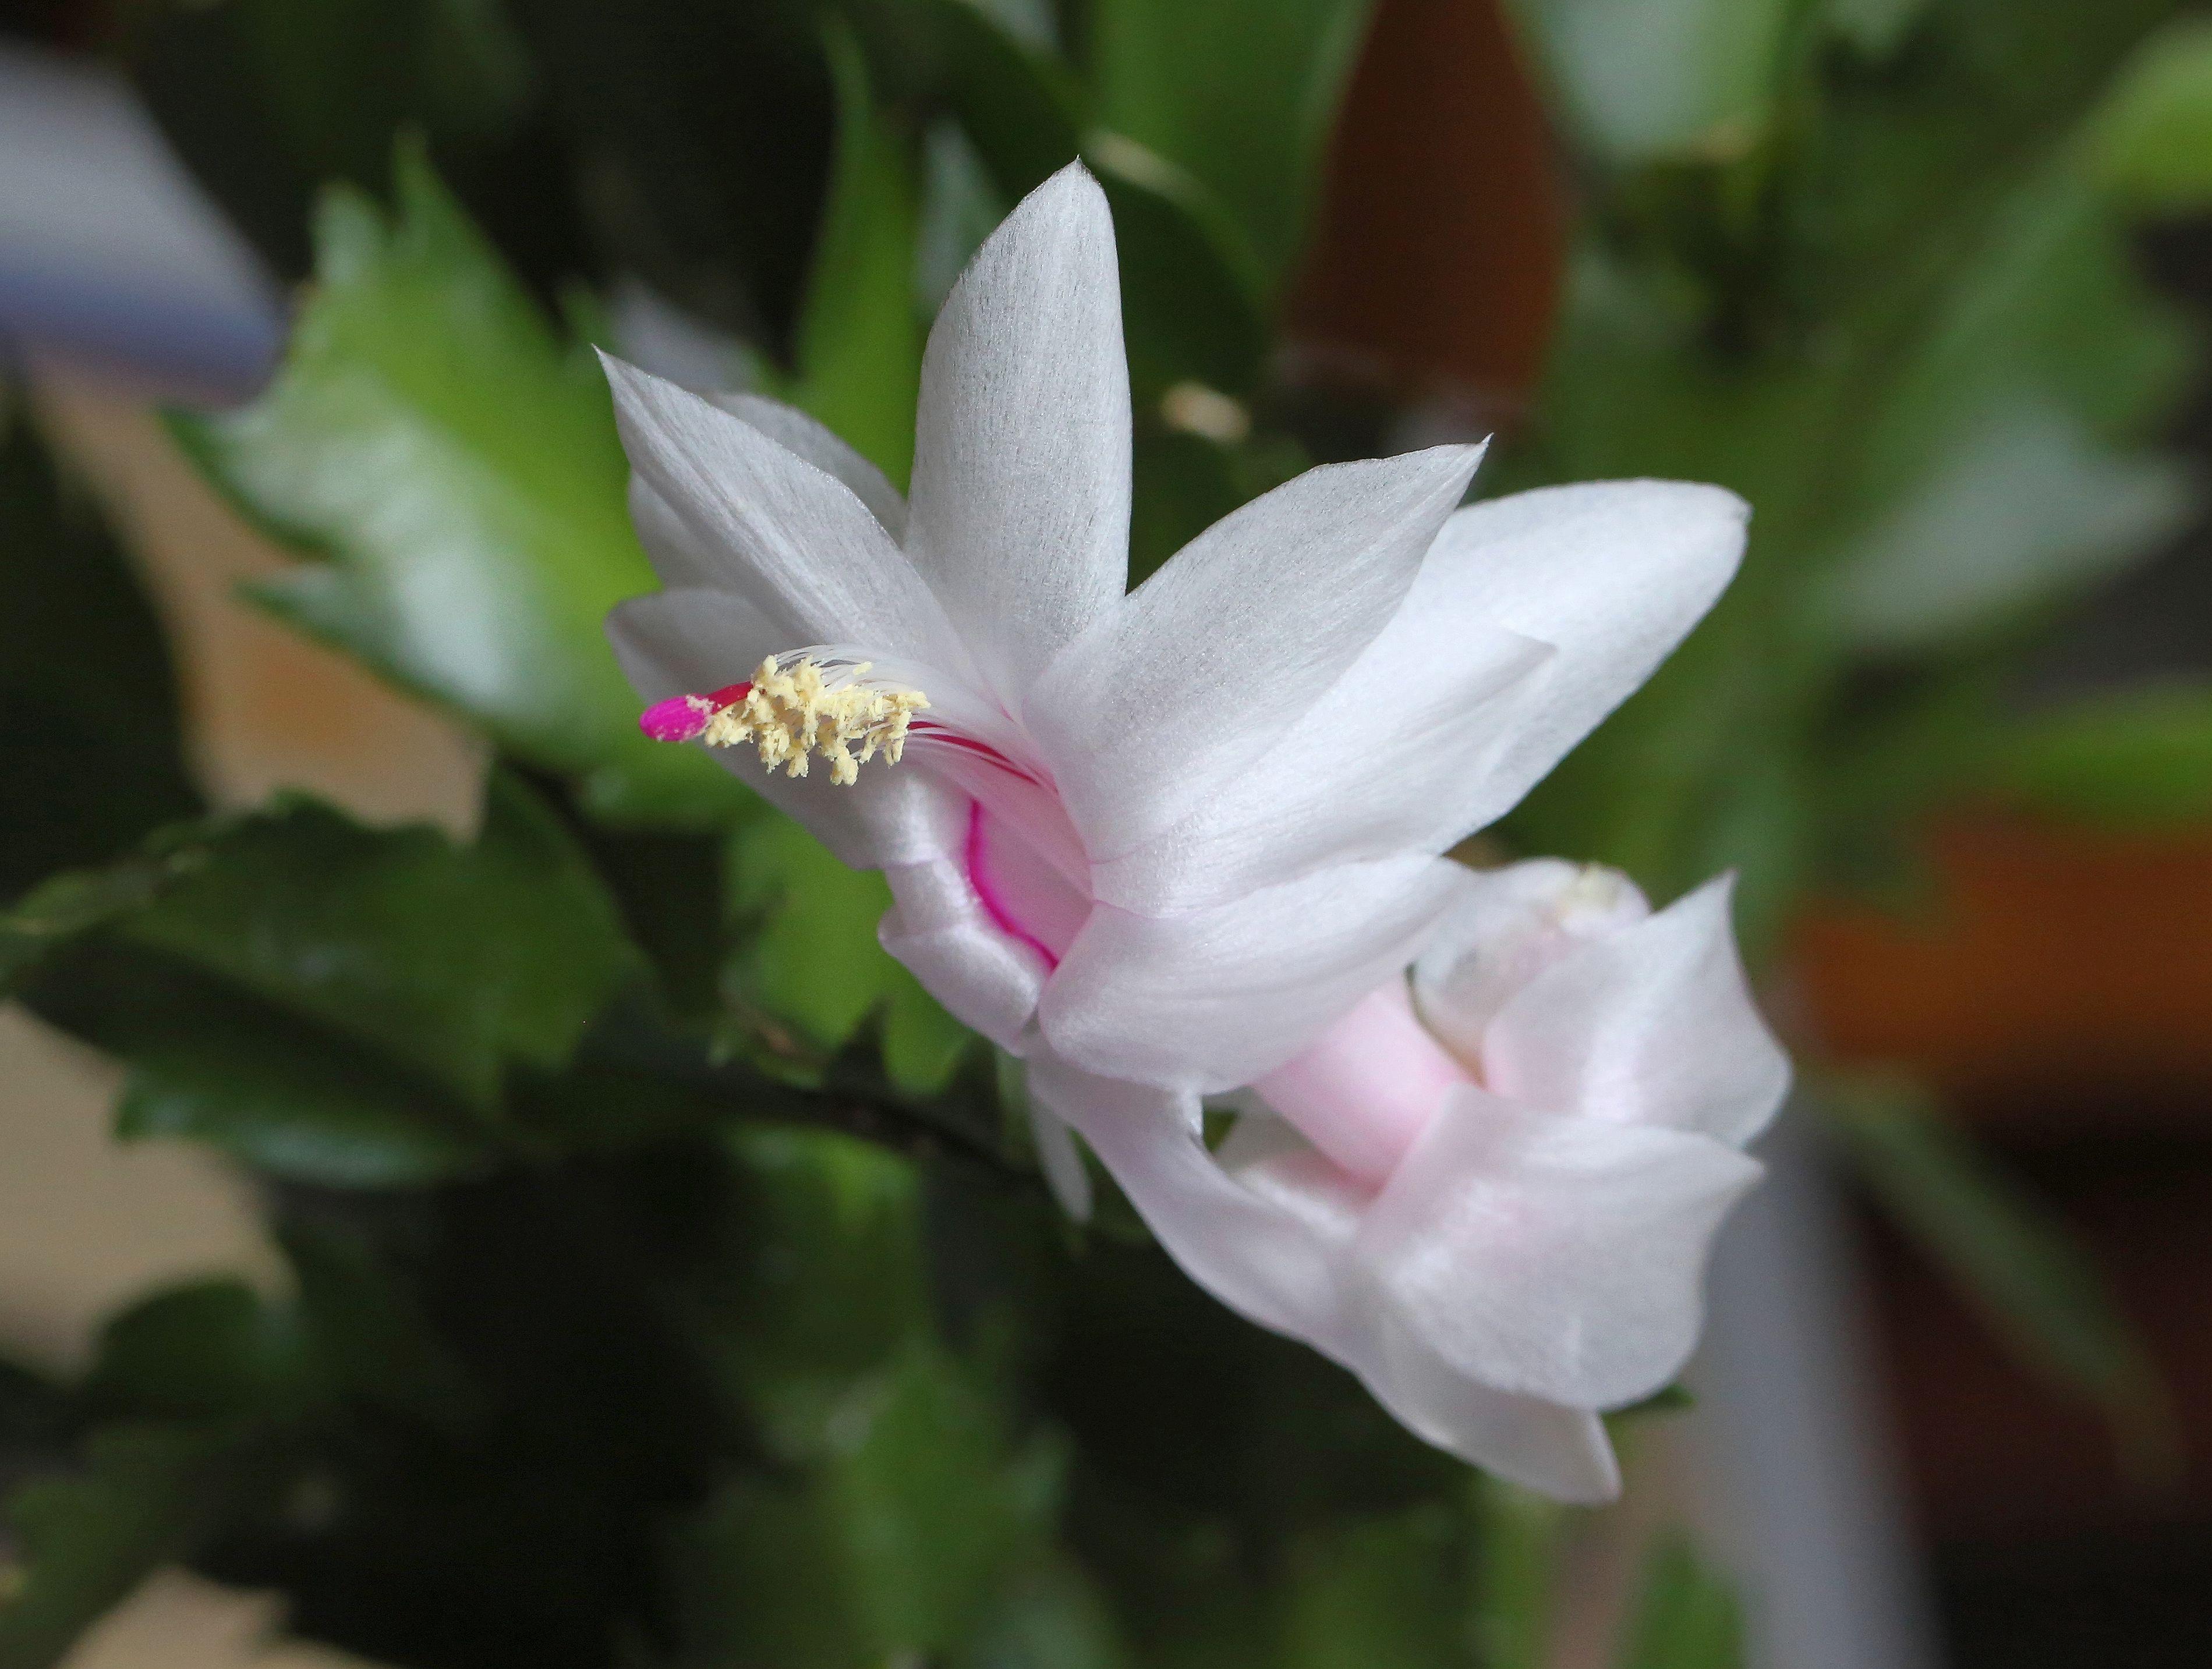 Free Images Blossom White Petal Botany Flora Macro